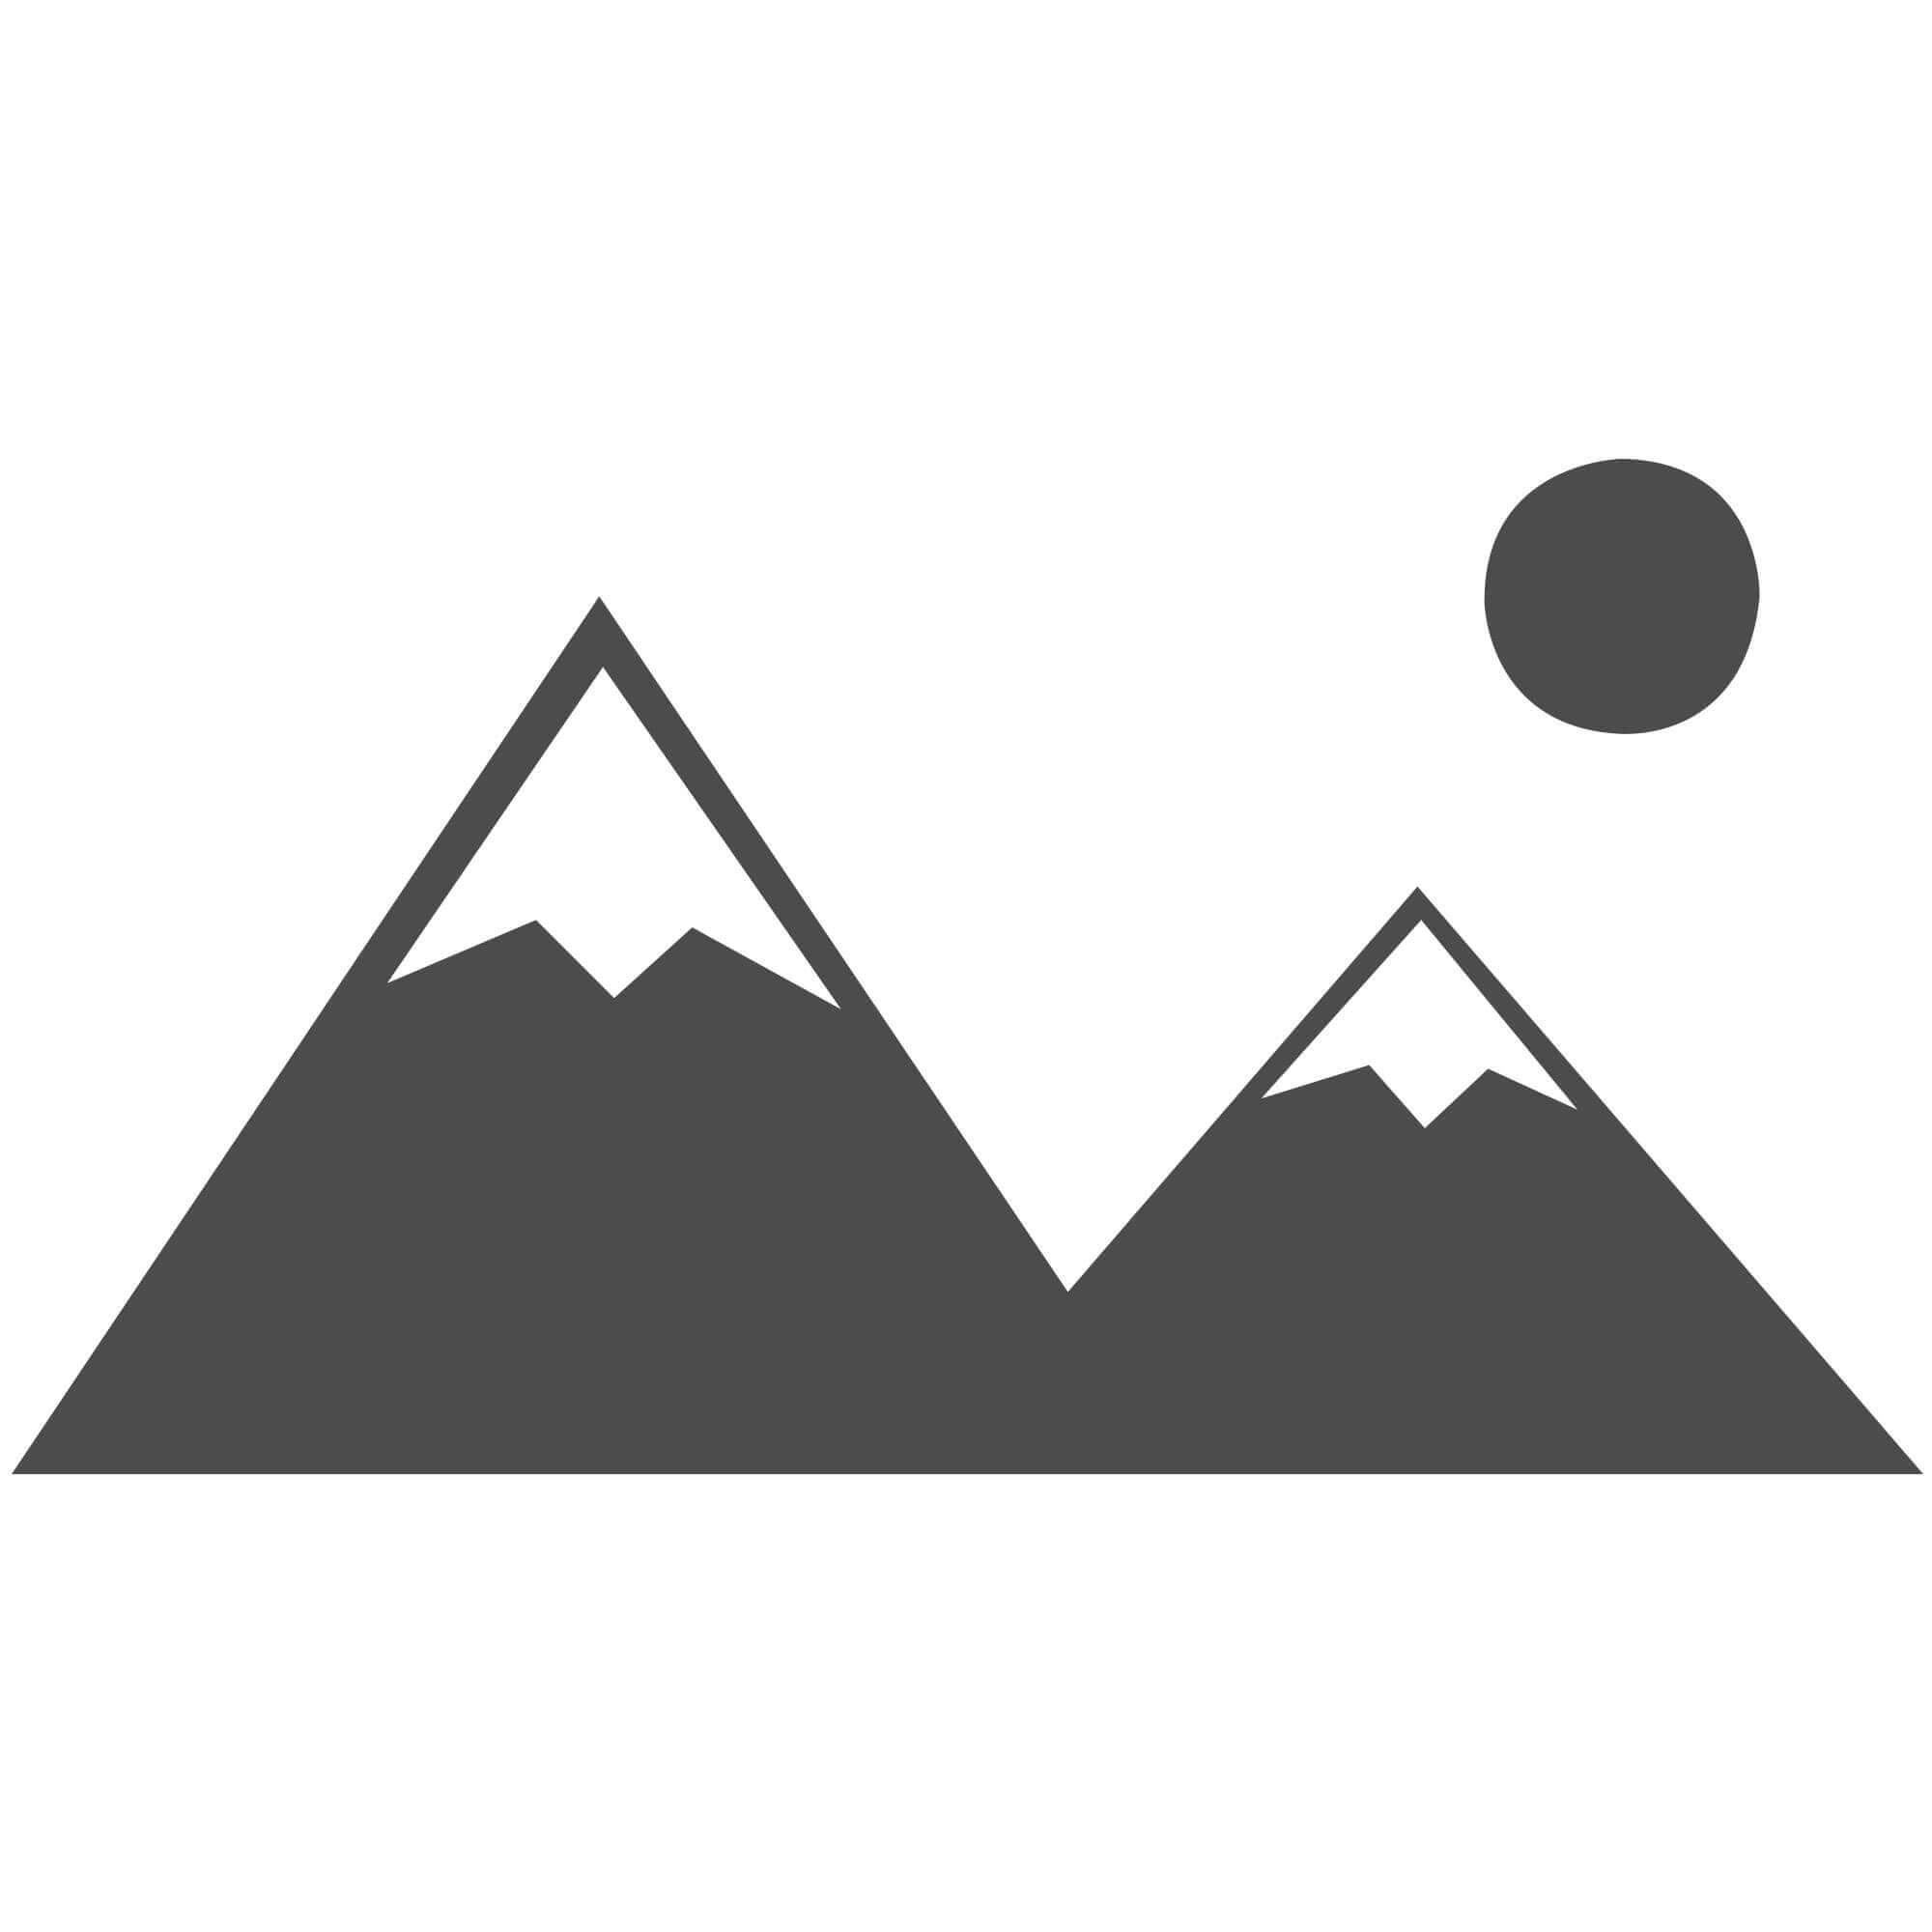 "Velvet Bijoux Rug - Black Grey - Size 80 x 150 cm (2'8"" x 5')"